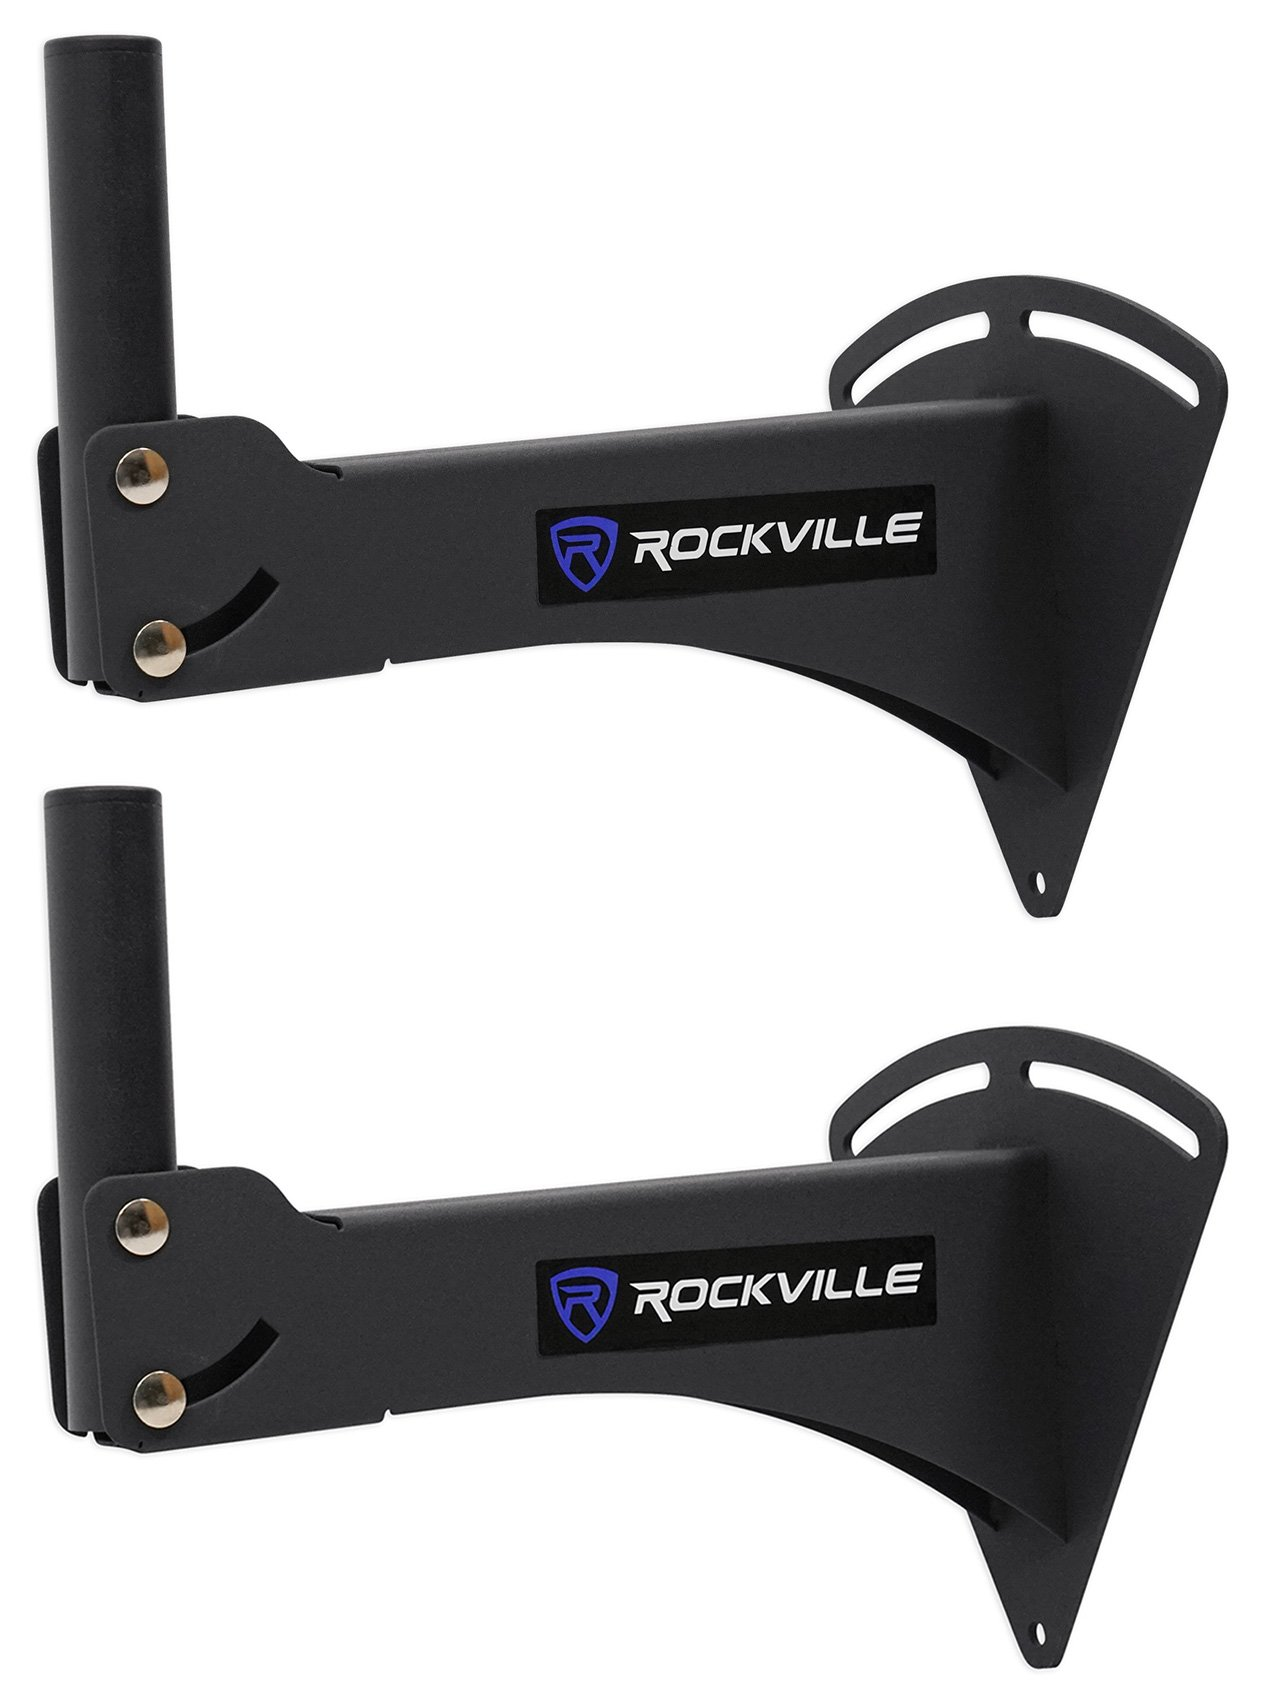 Rockville RPW20 Adjustable Wall Mount Bracket for PA Speaker Installations, Pair